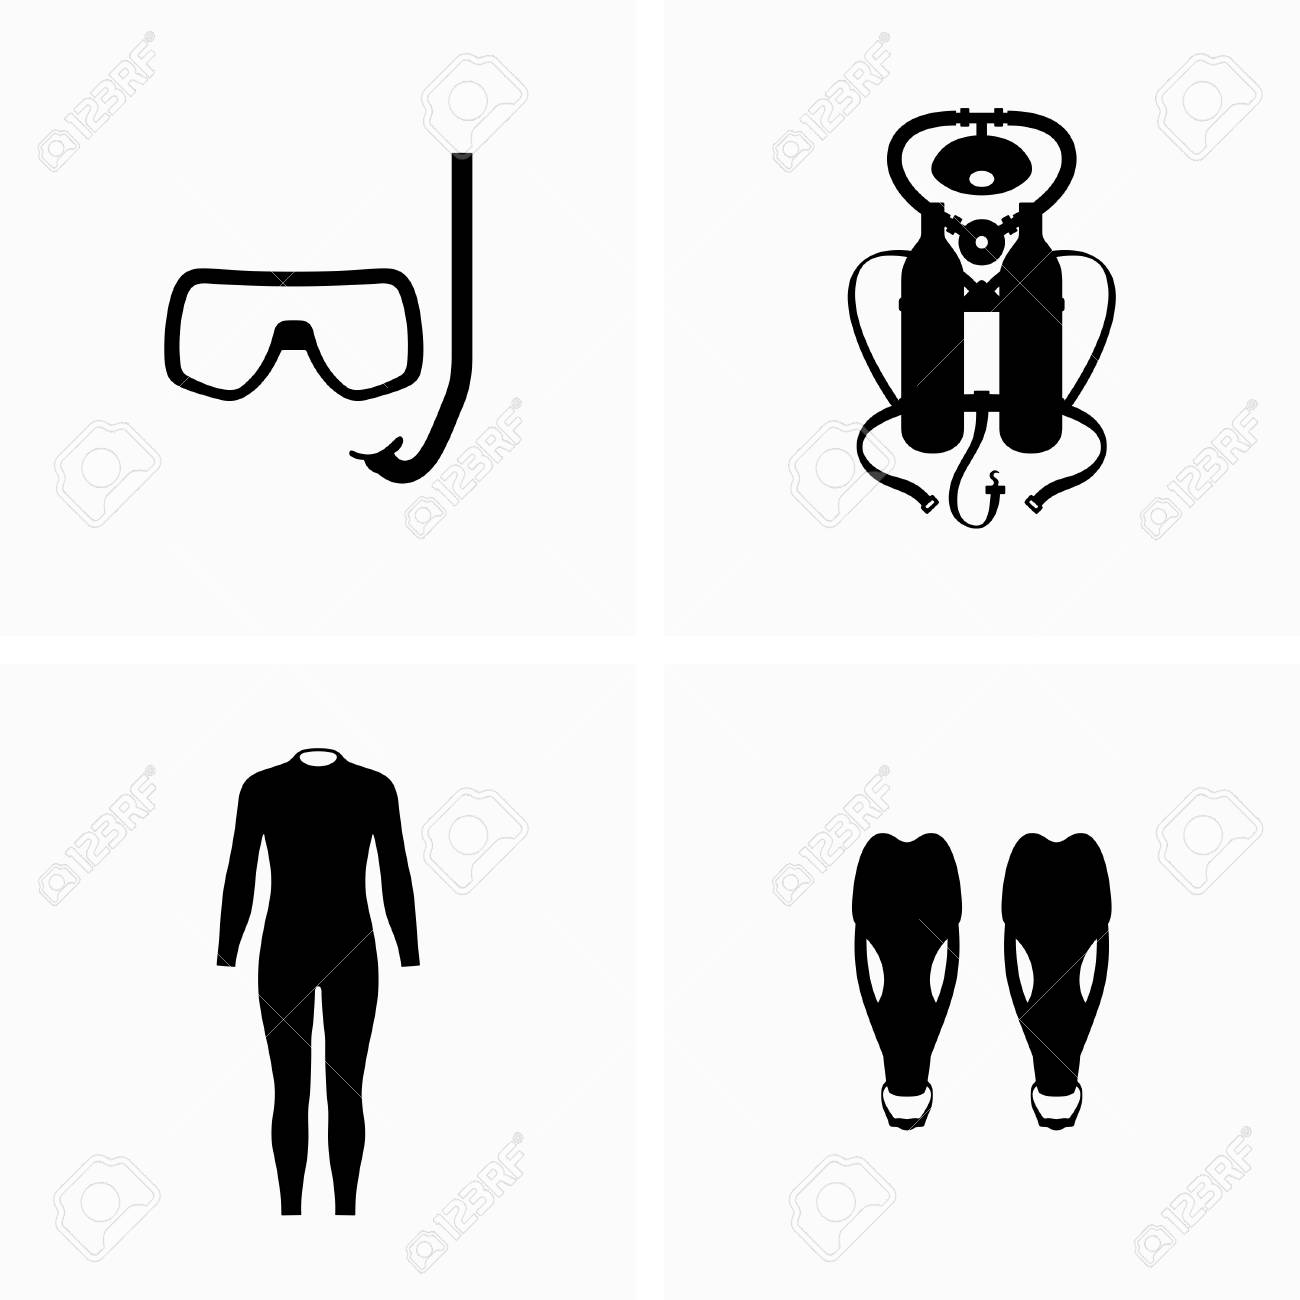 Diving, scuba equipment, wetsuit and fins - Vector - 120559655